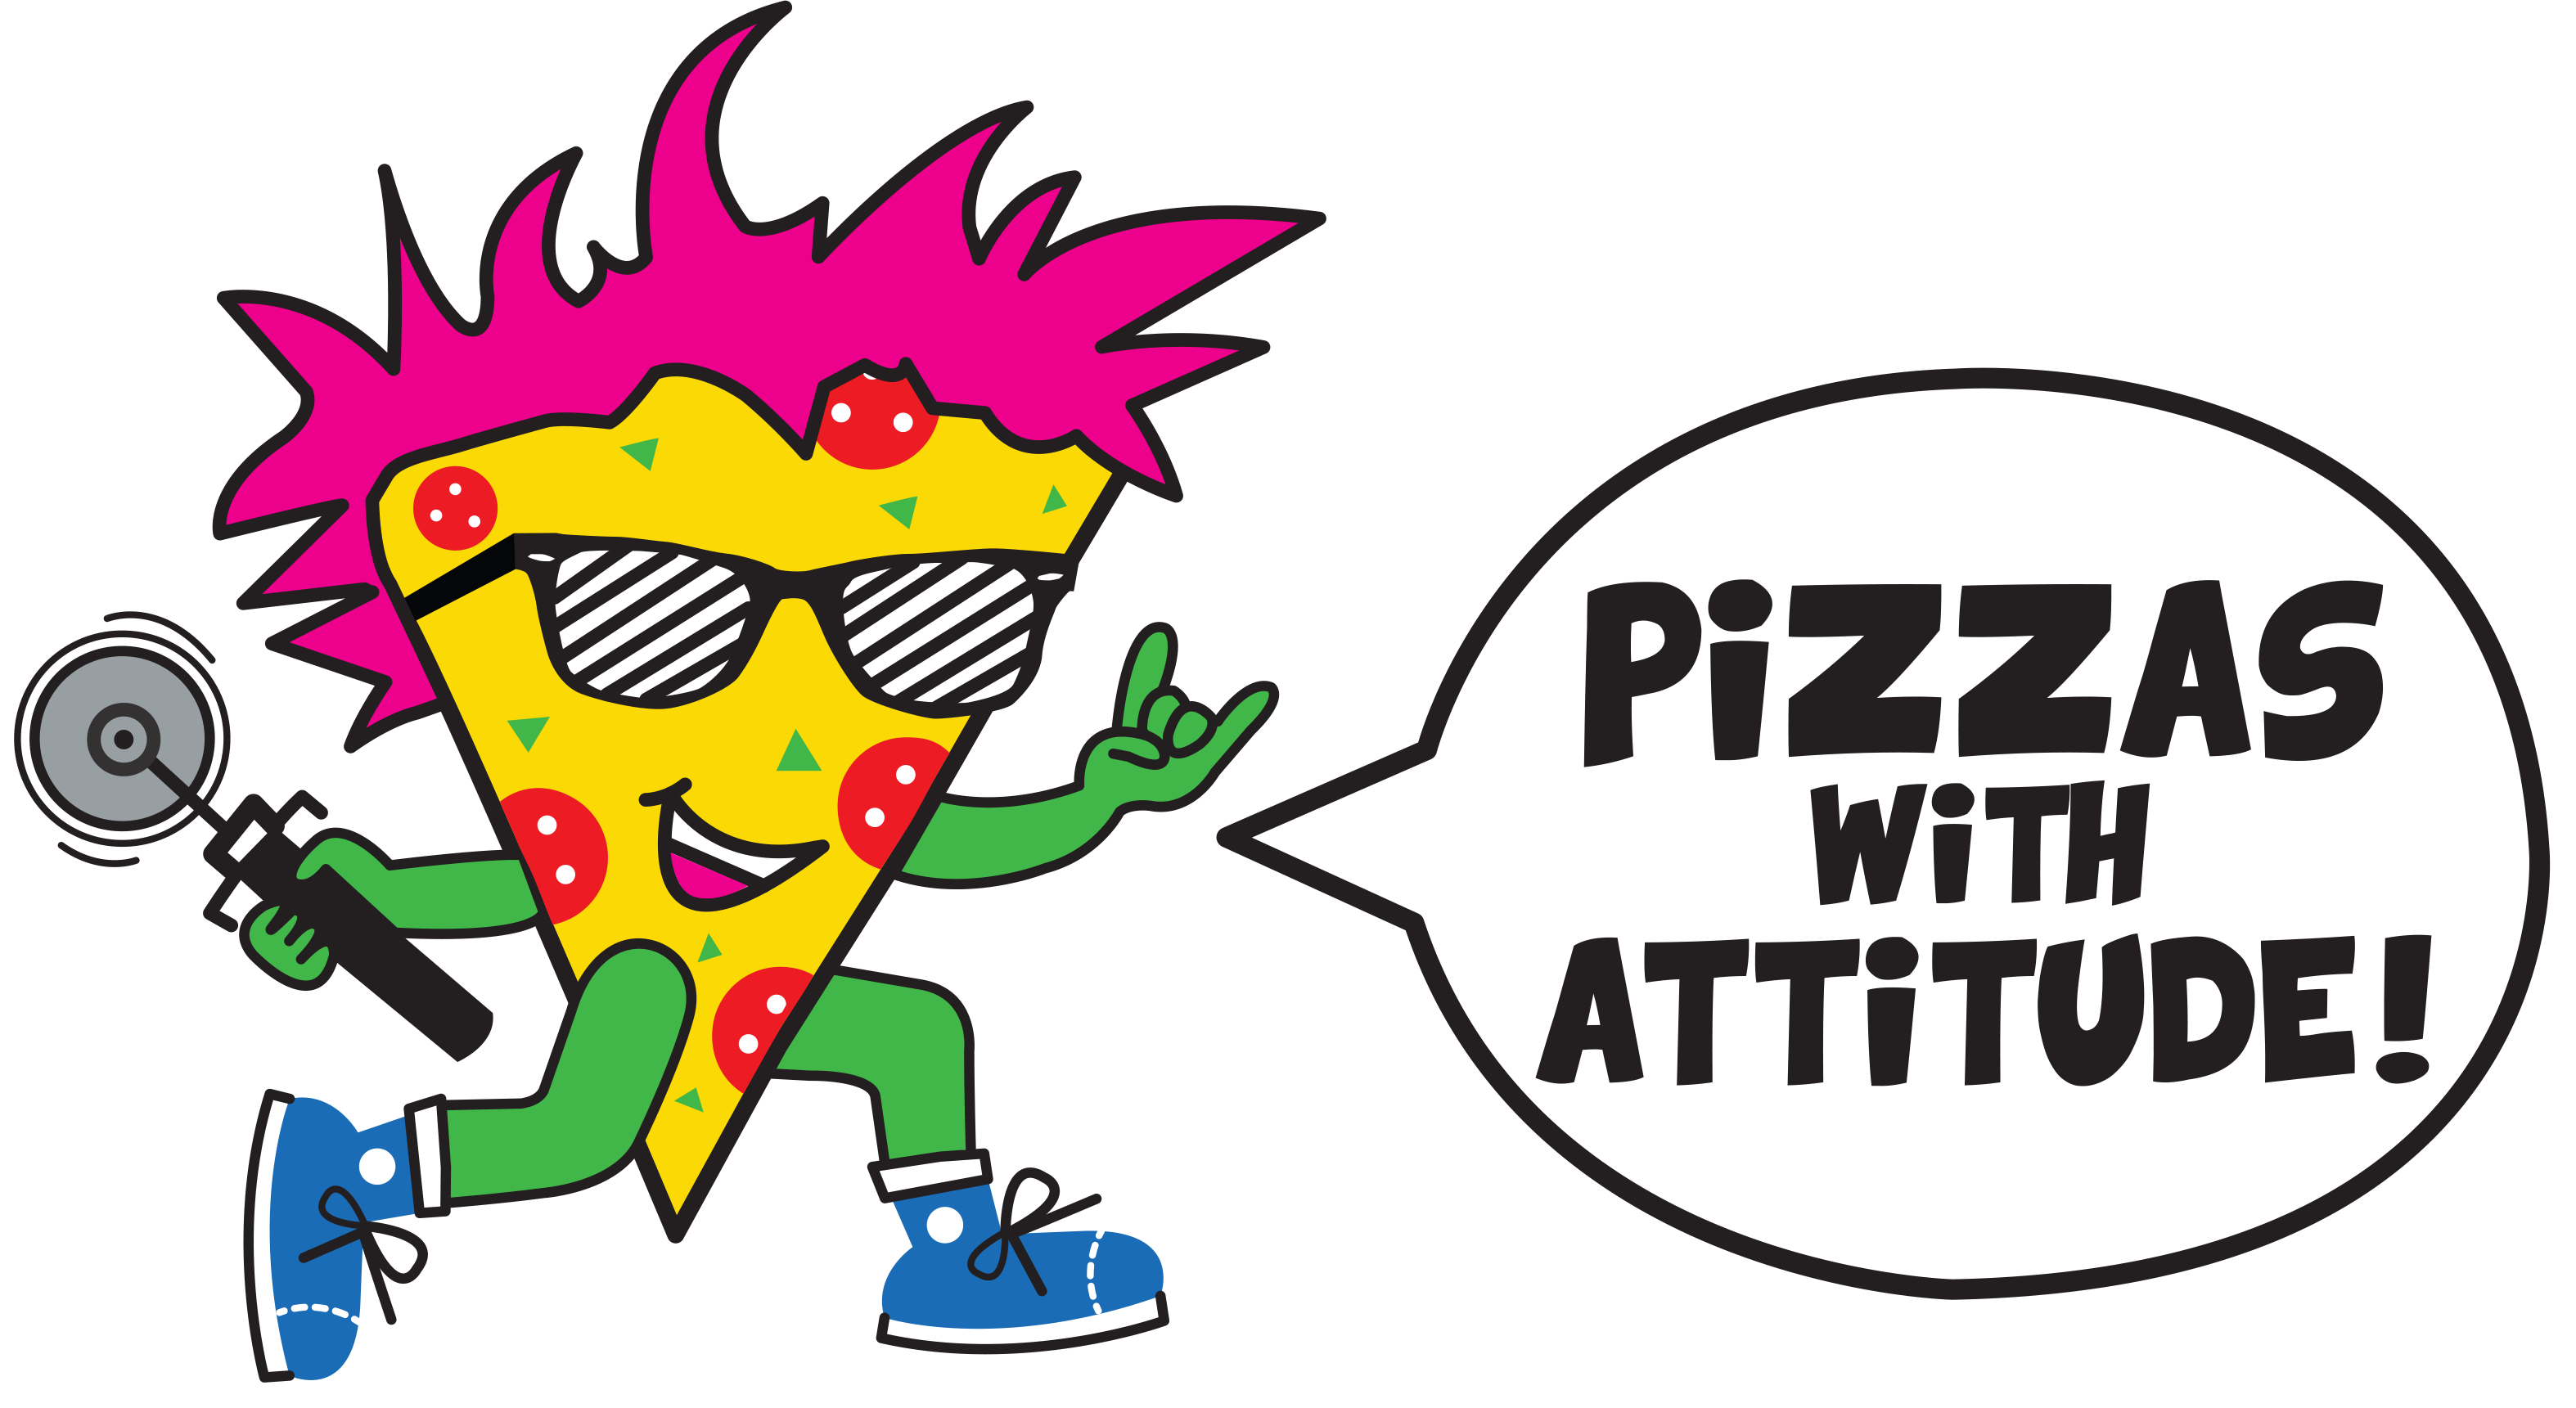 Pizzas with Attitude